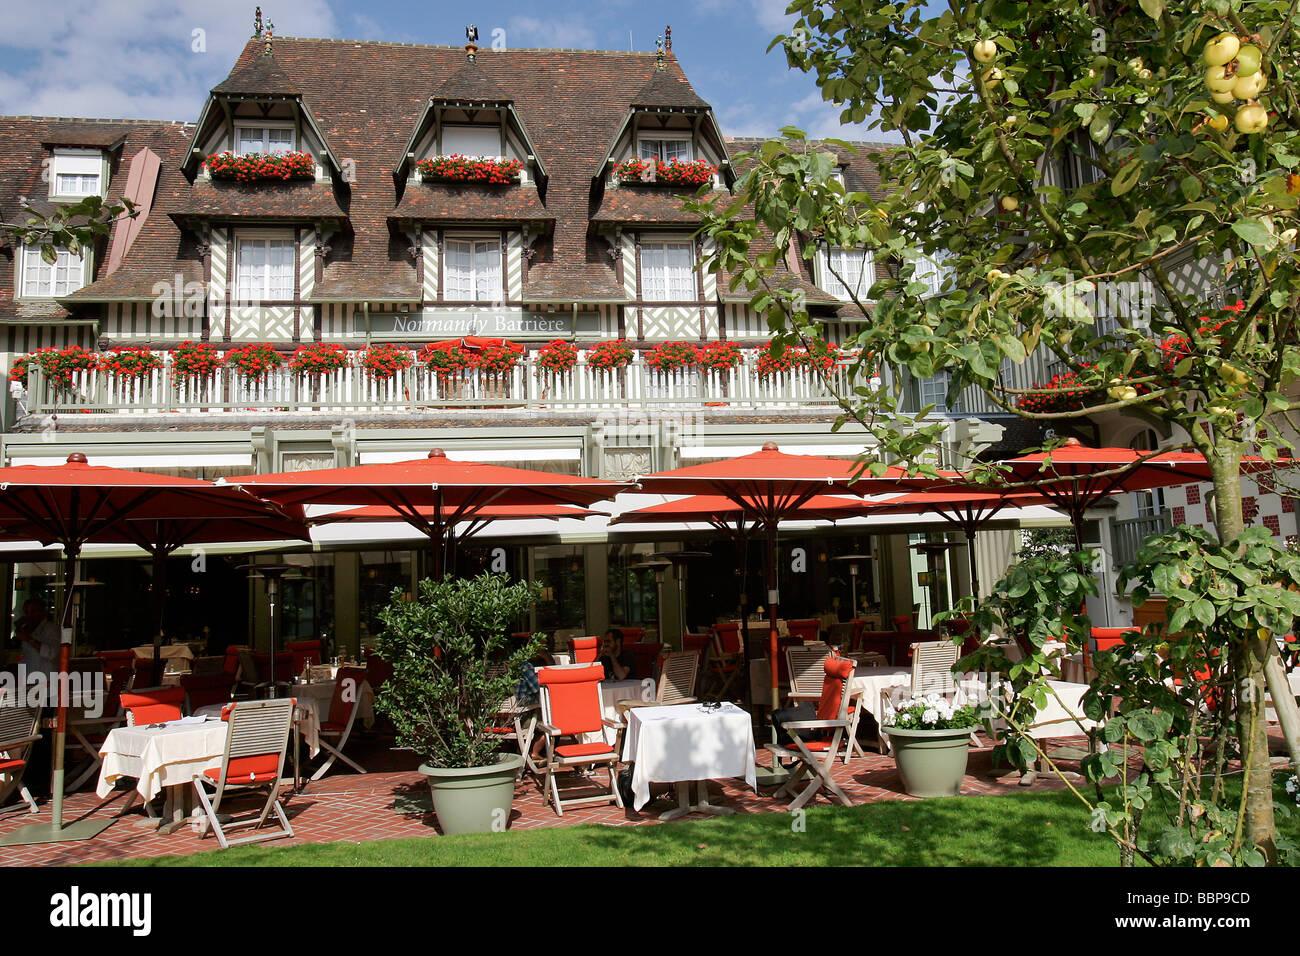 39 la belle epoque 39 hotel restaurant 39 le normandy barriere for Epoque hotel